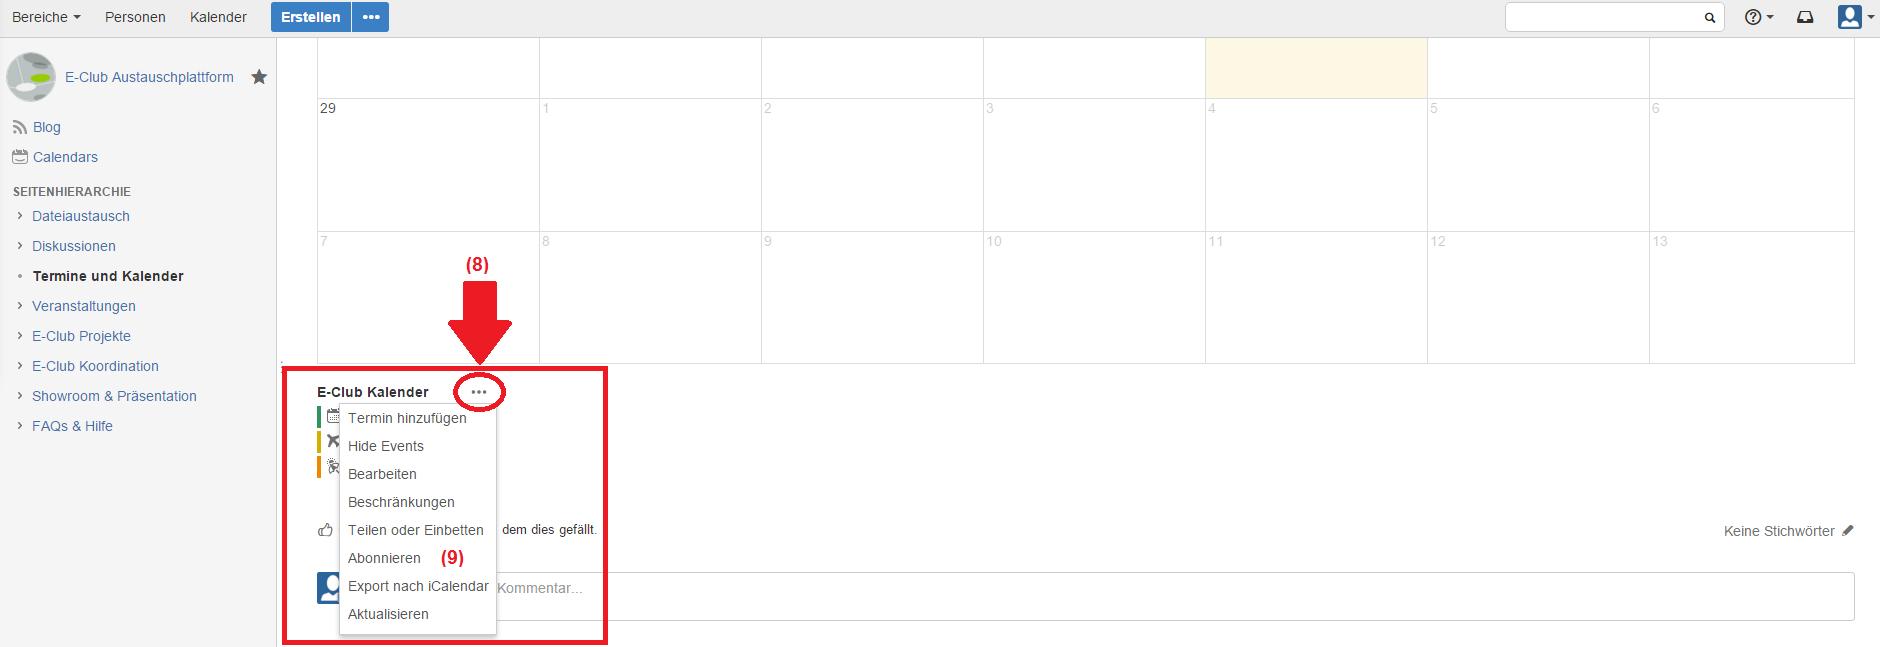 Fu Berlin Kalender